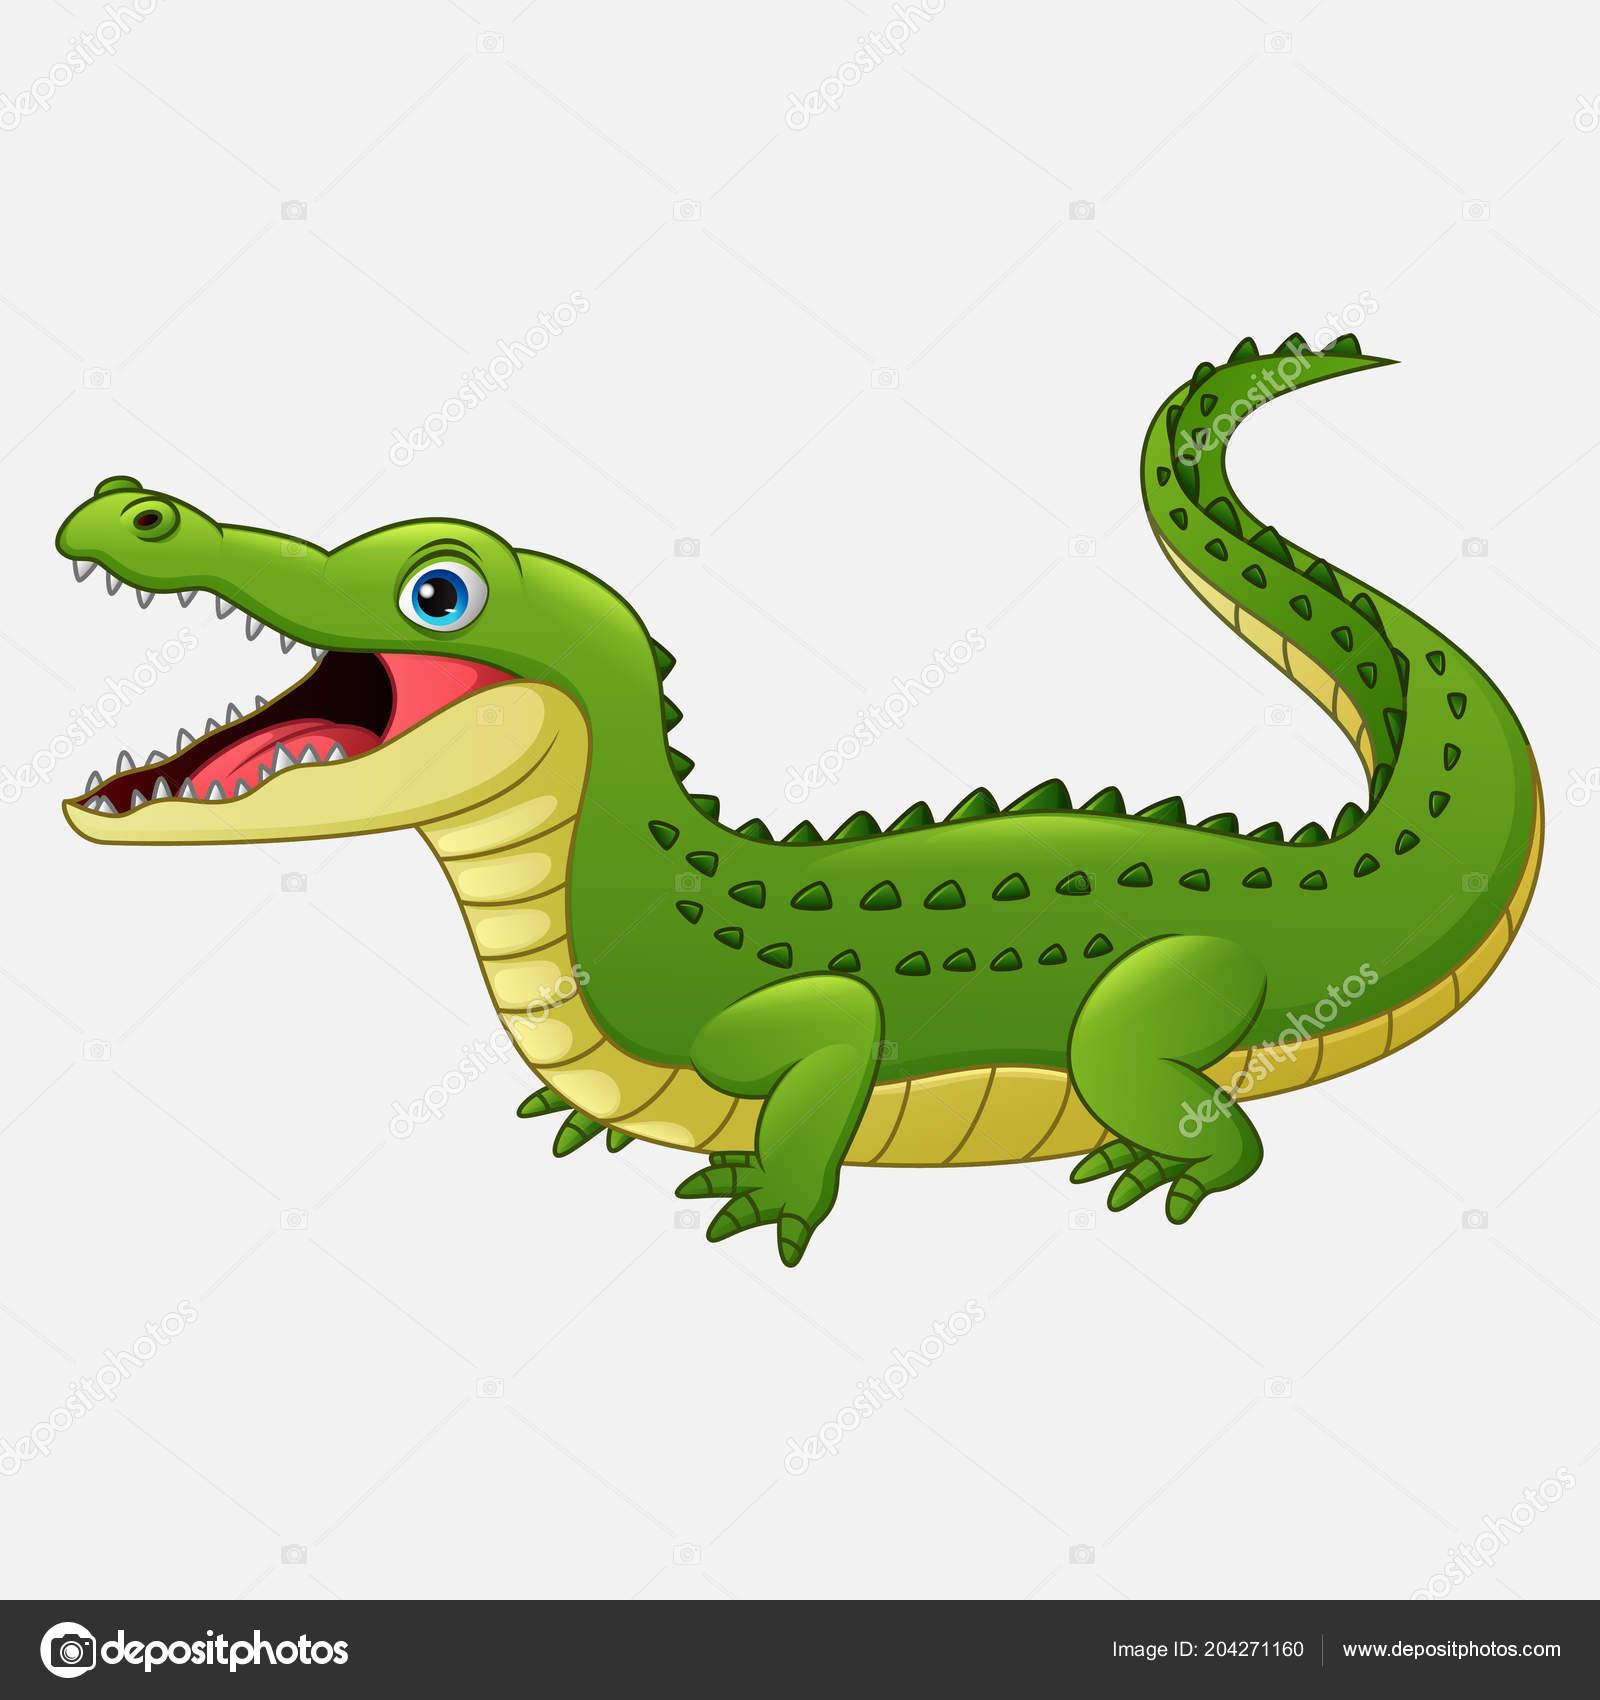 Crocodile dessin anim isol sur fond blanc image vectorielle dreamcreation01 204271160 - Dessin anime les crocodiles ...